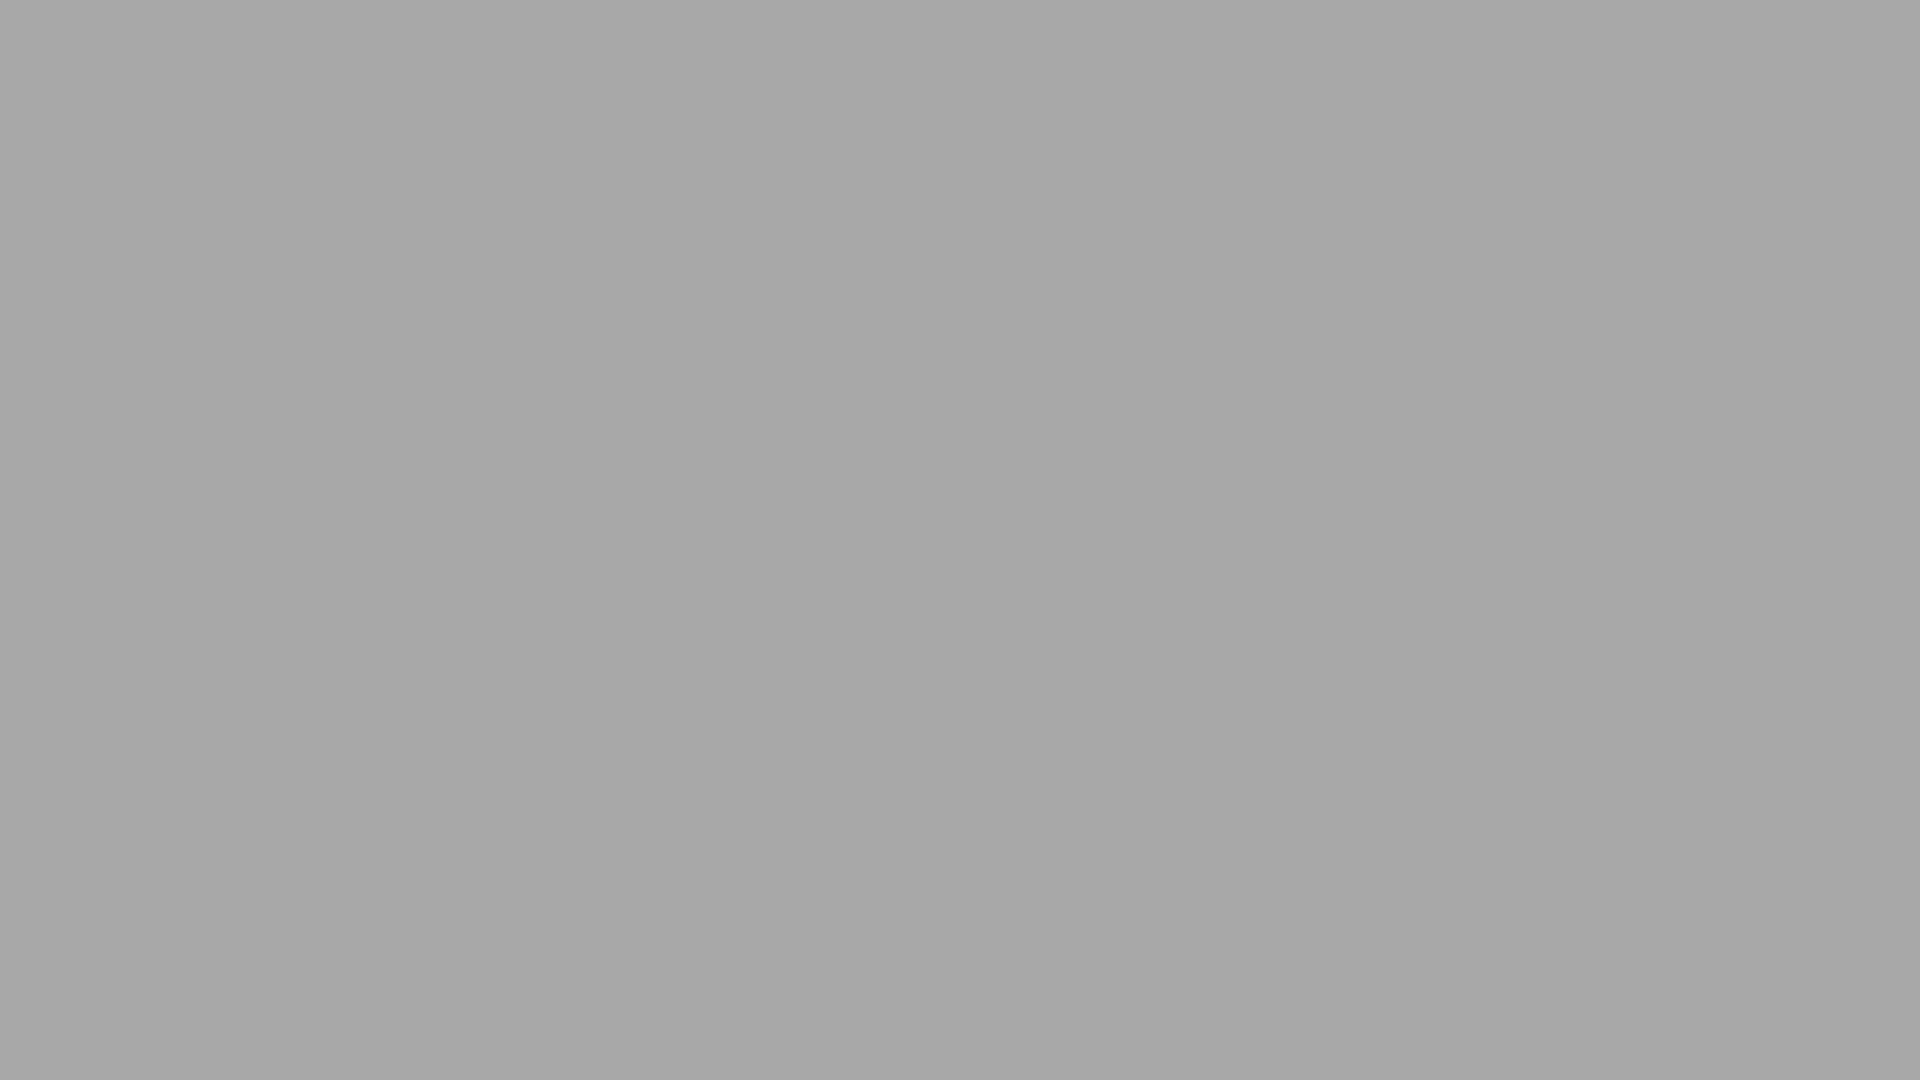 404-bg